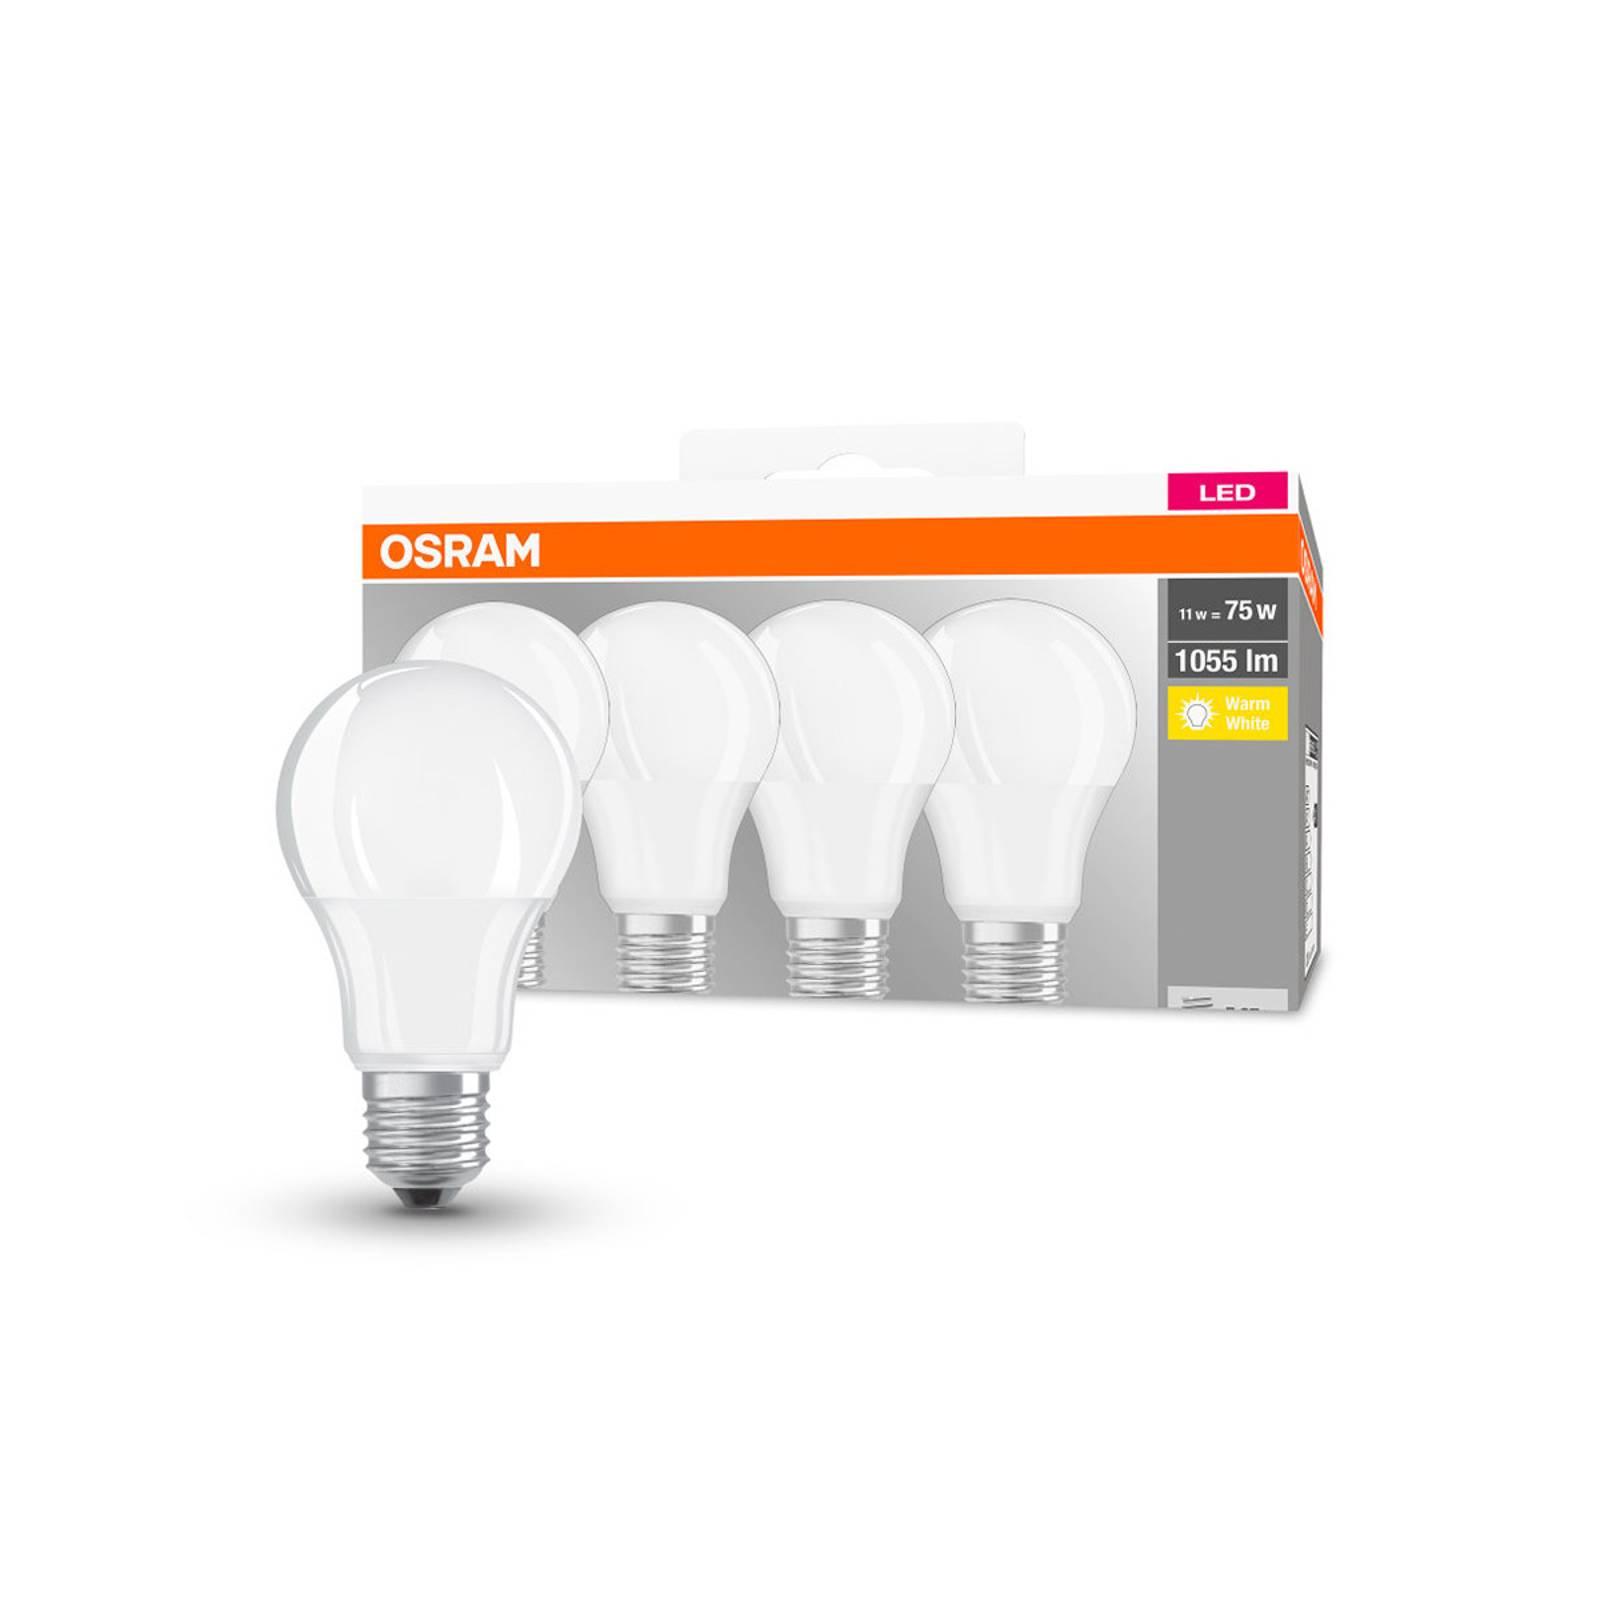 OSRAM-LED-lamppu Classic E27 10W 2700K 1055lm 4kpl